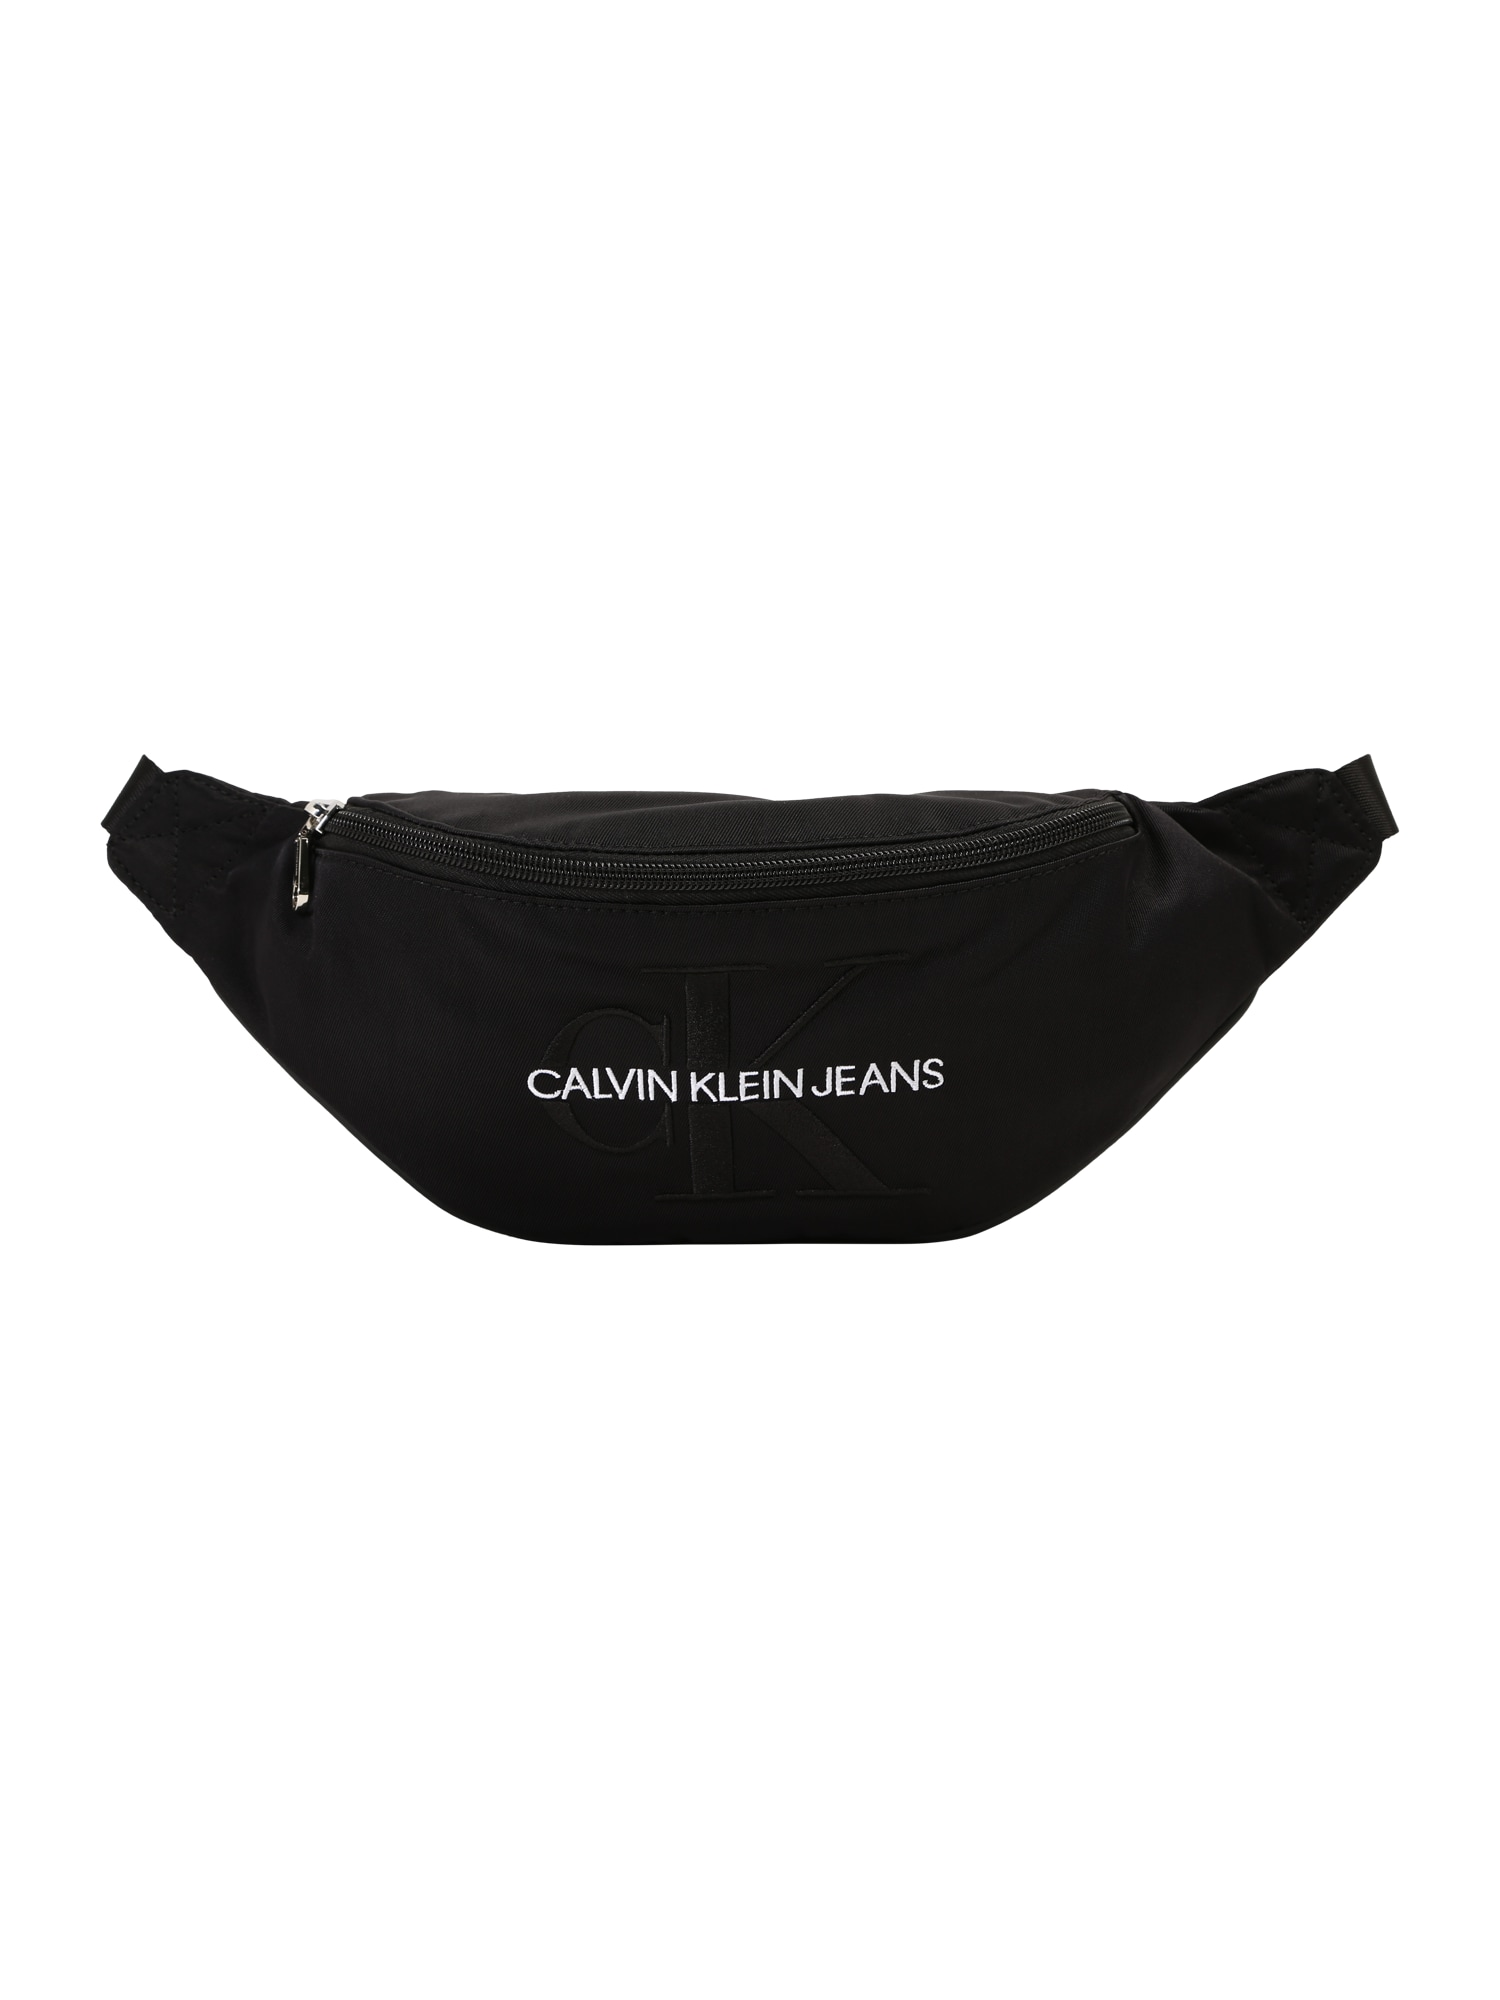 Calvin Klein Jeans Ledvinka 'MONOGRAM STREET PACK'  černá